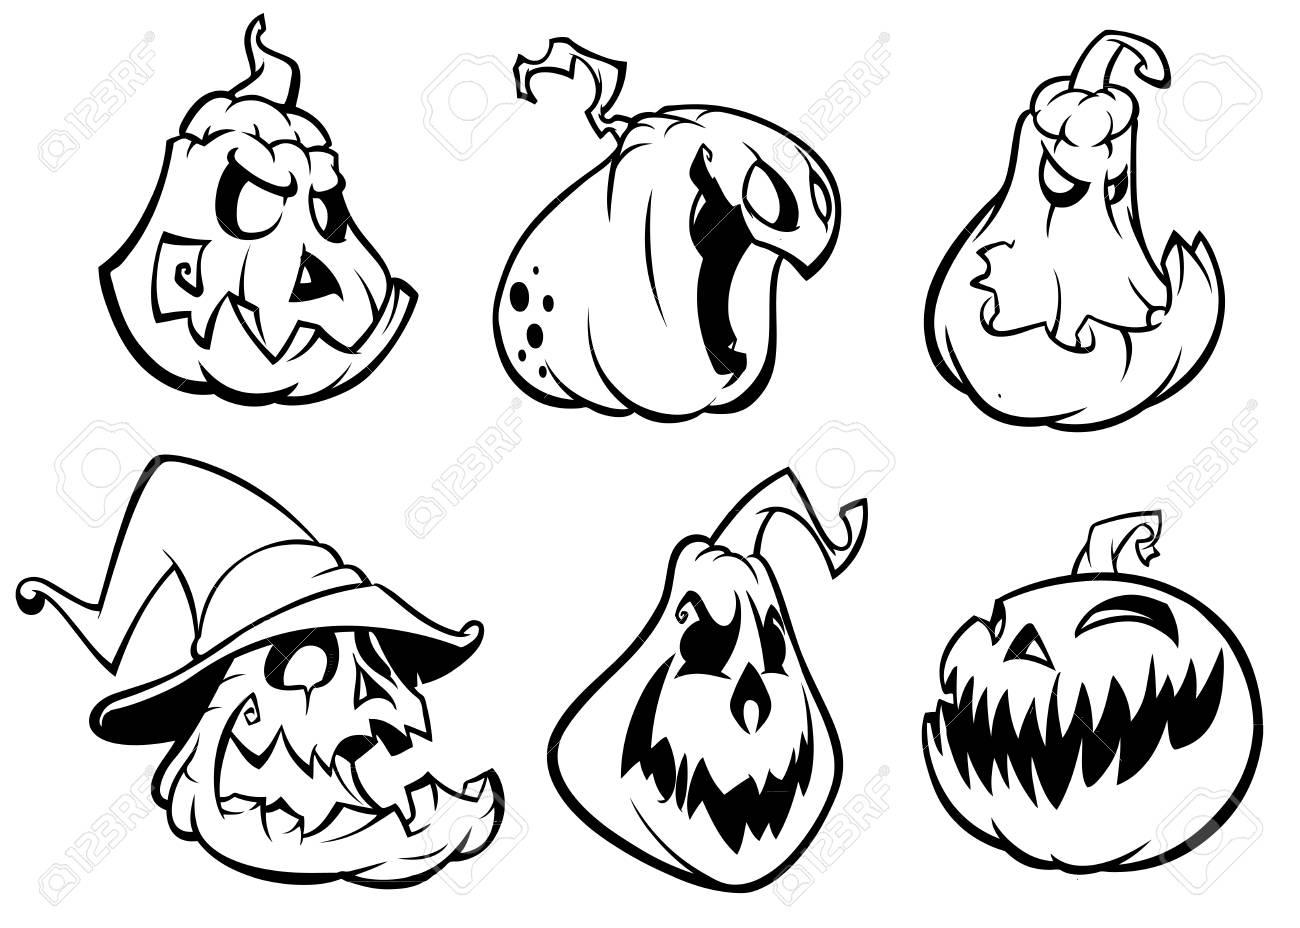 Halloween Pumpkins Curved With Jack O Lantern Face Vector Cartoon